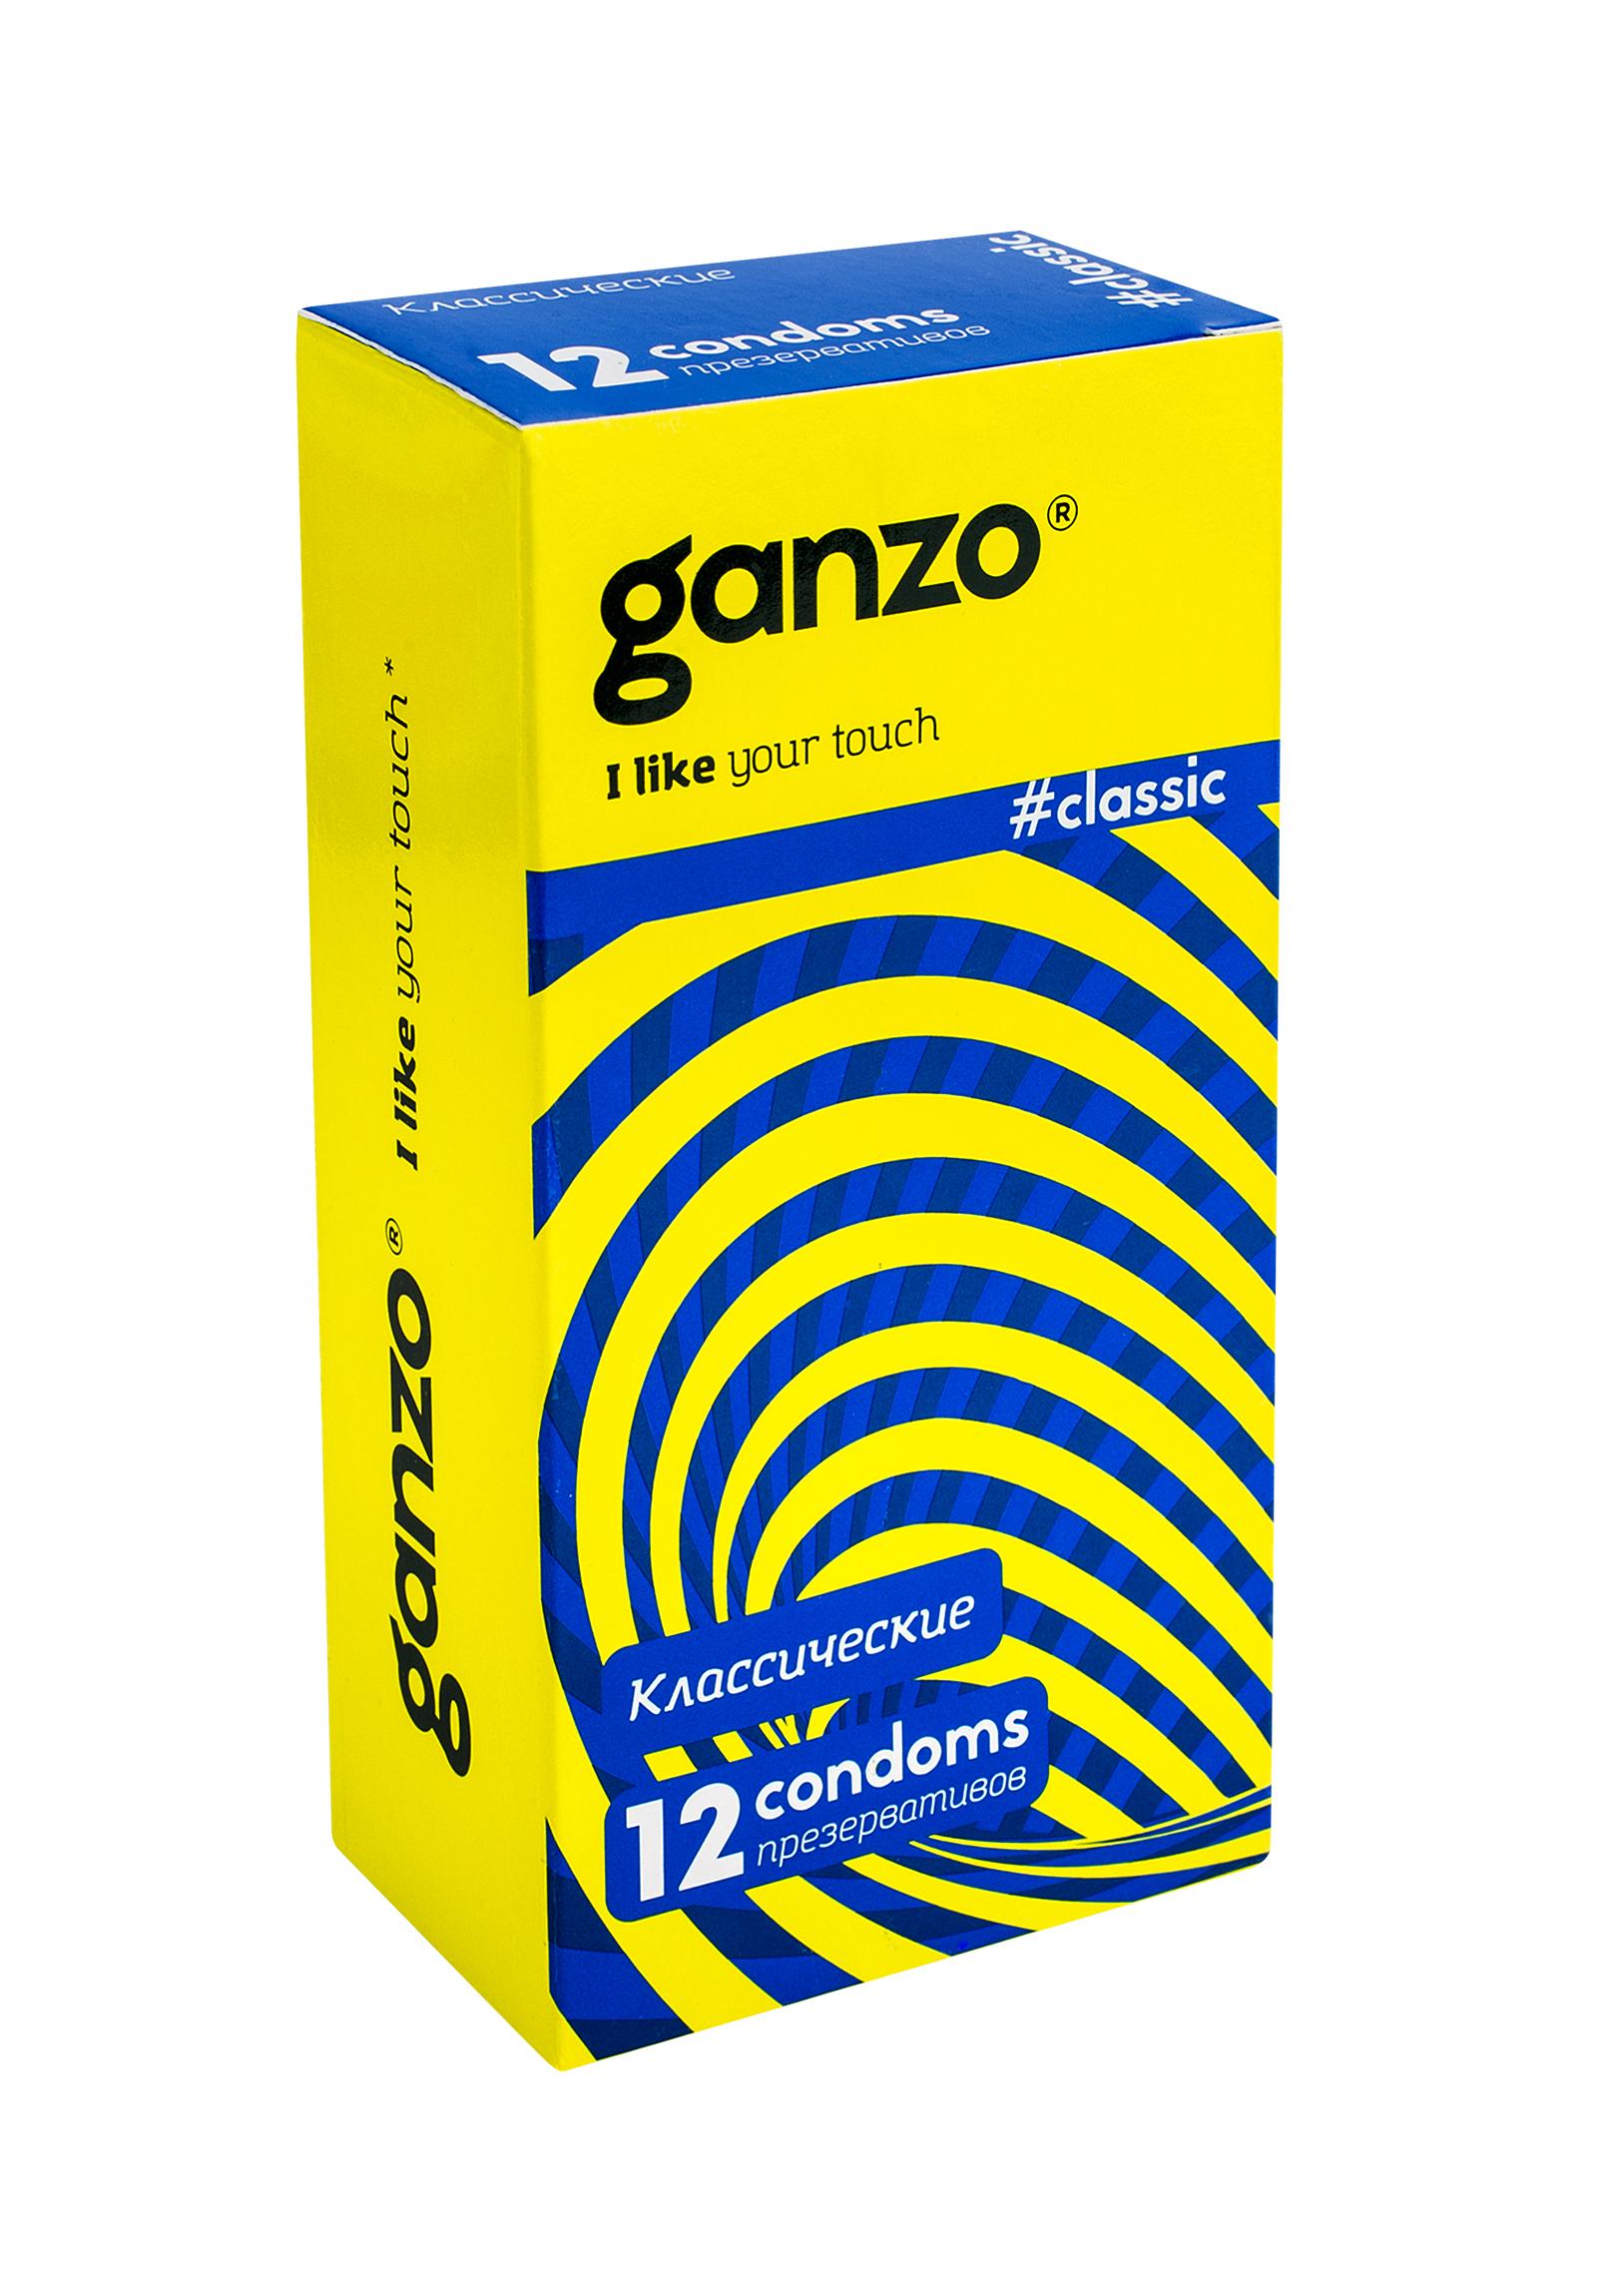 Ганзо презервативы №12 классик